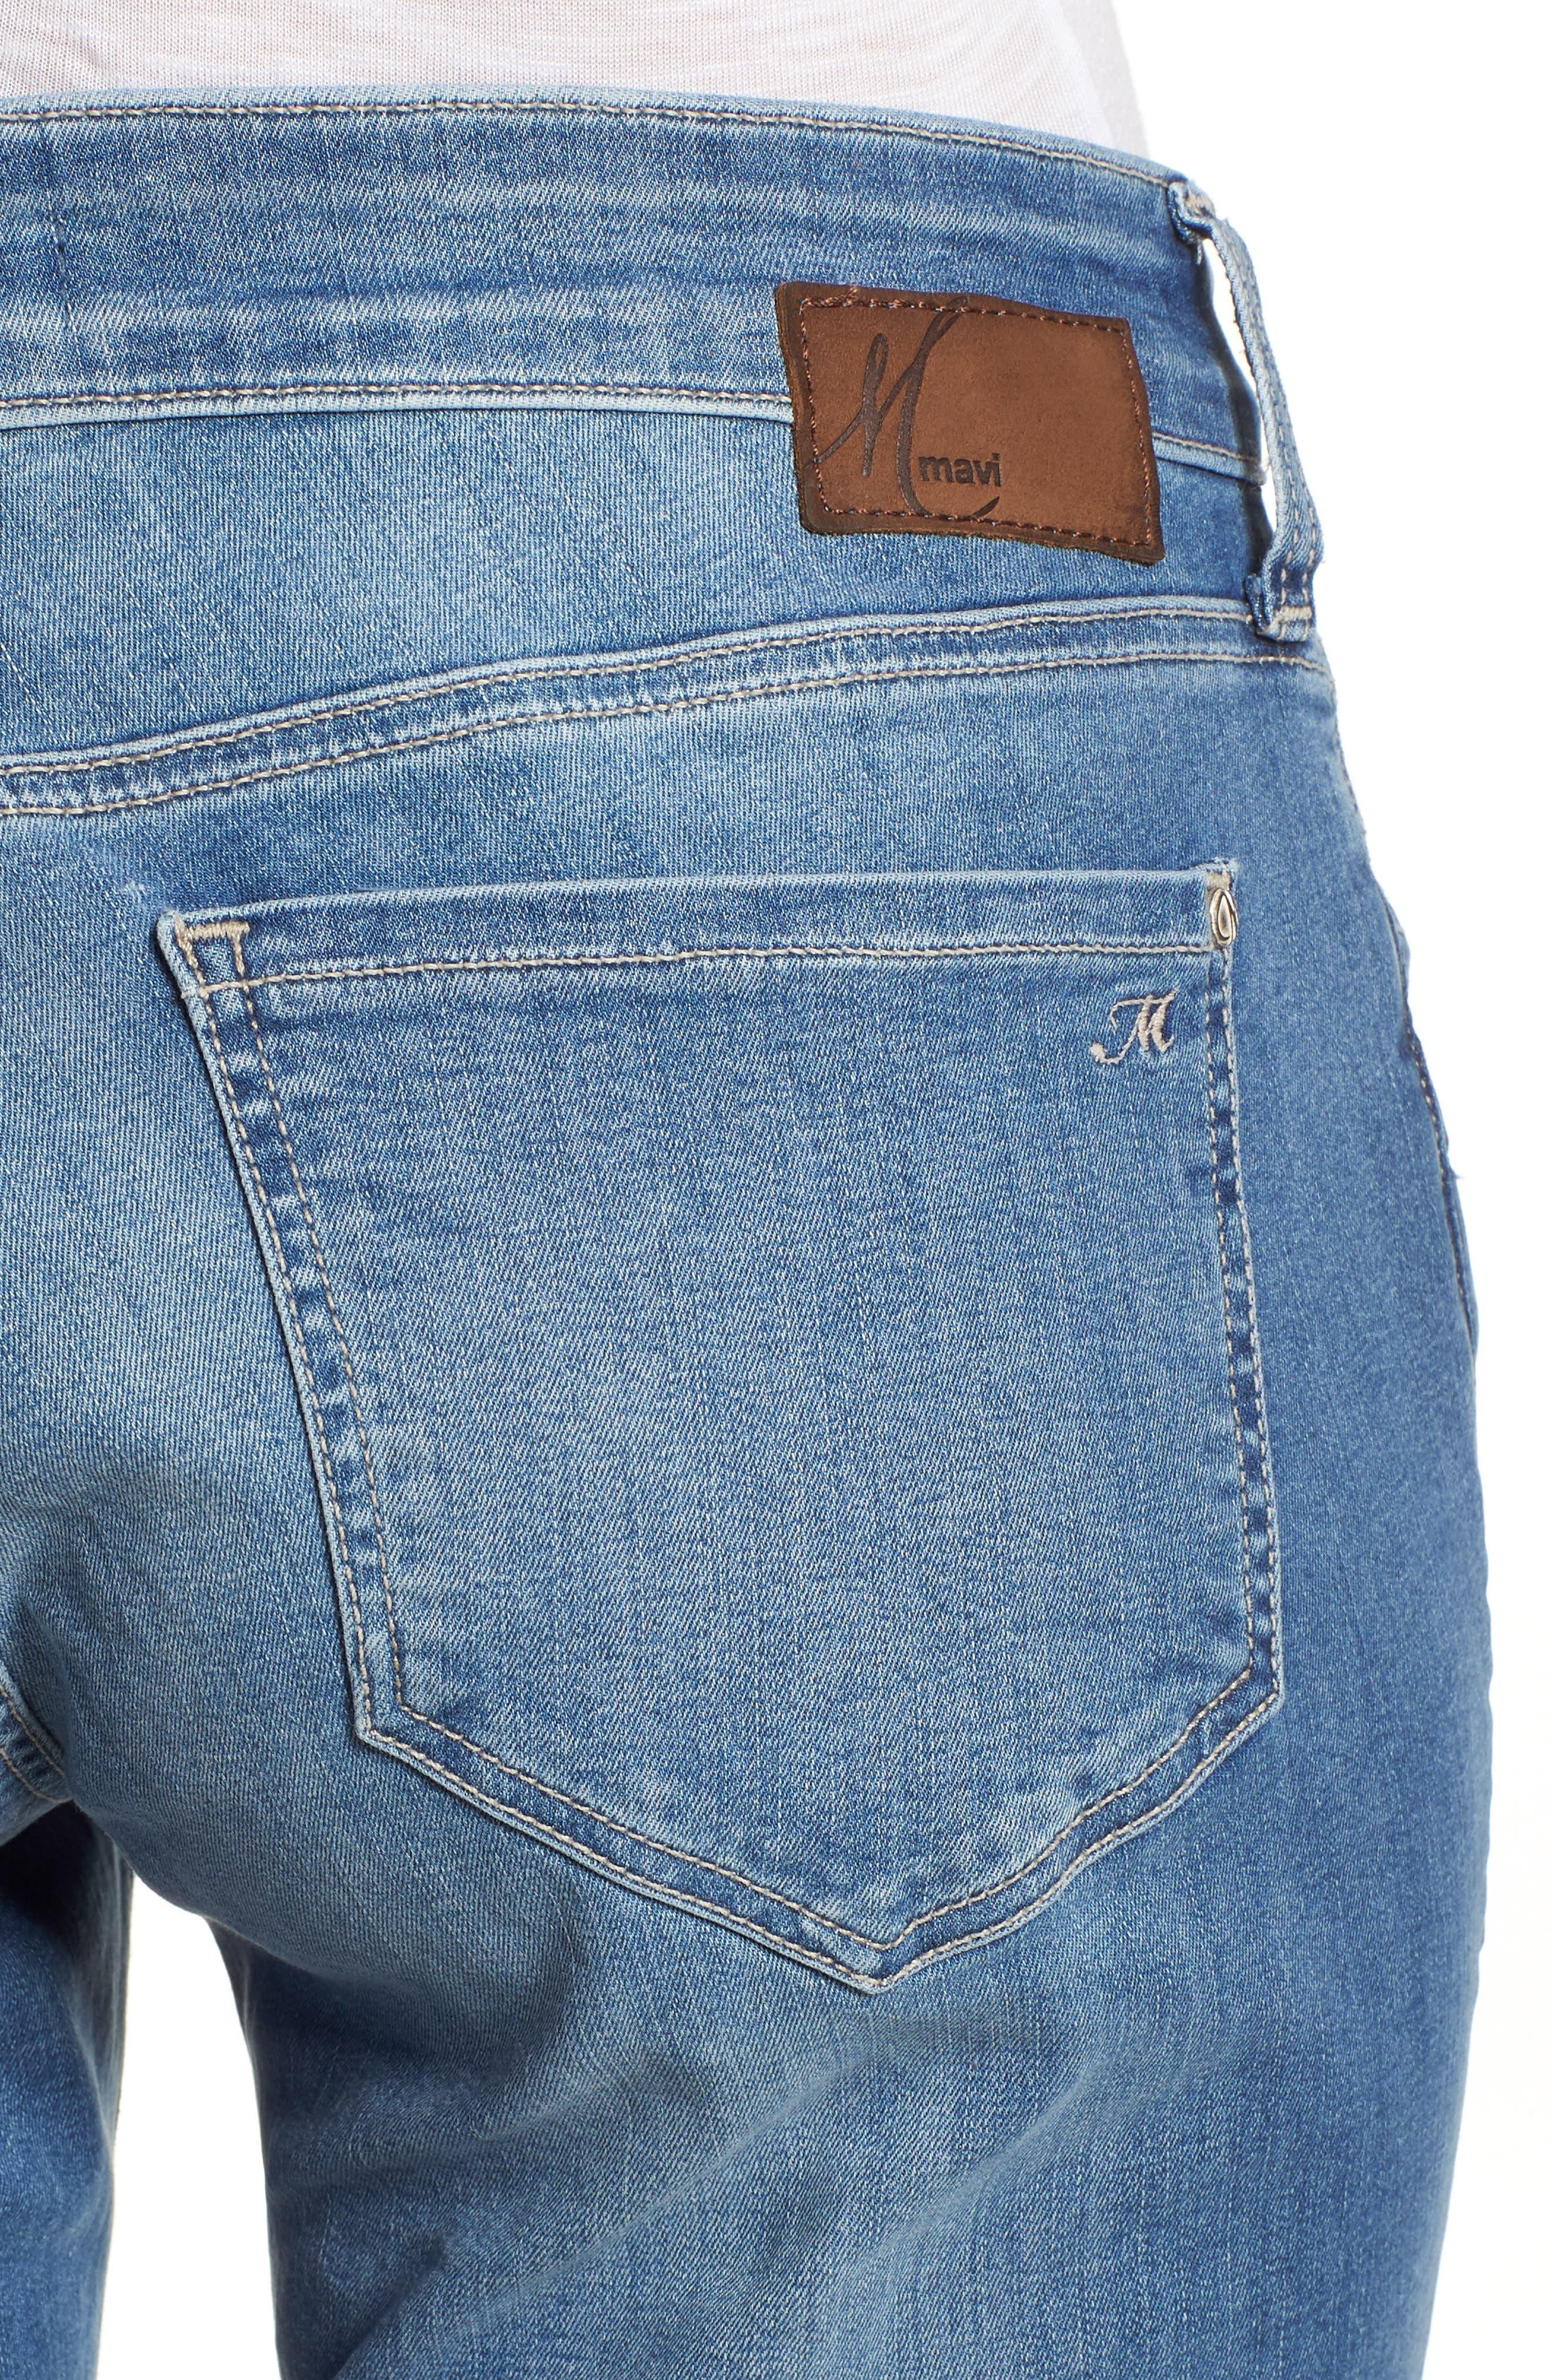 MAVI JEANS, Emma Slim Boyfriend Jeans, Alternate thumbnail 5, color, INDIGO RIPPED NOLITA